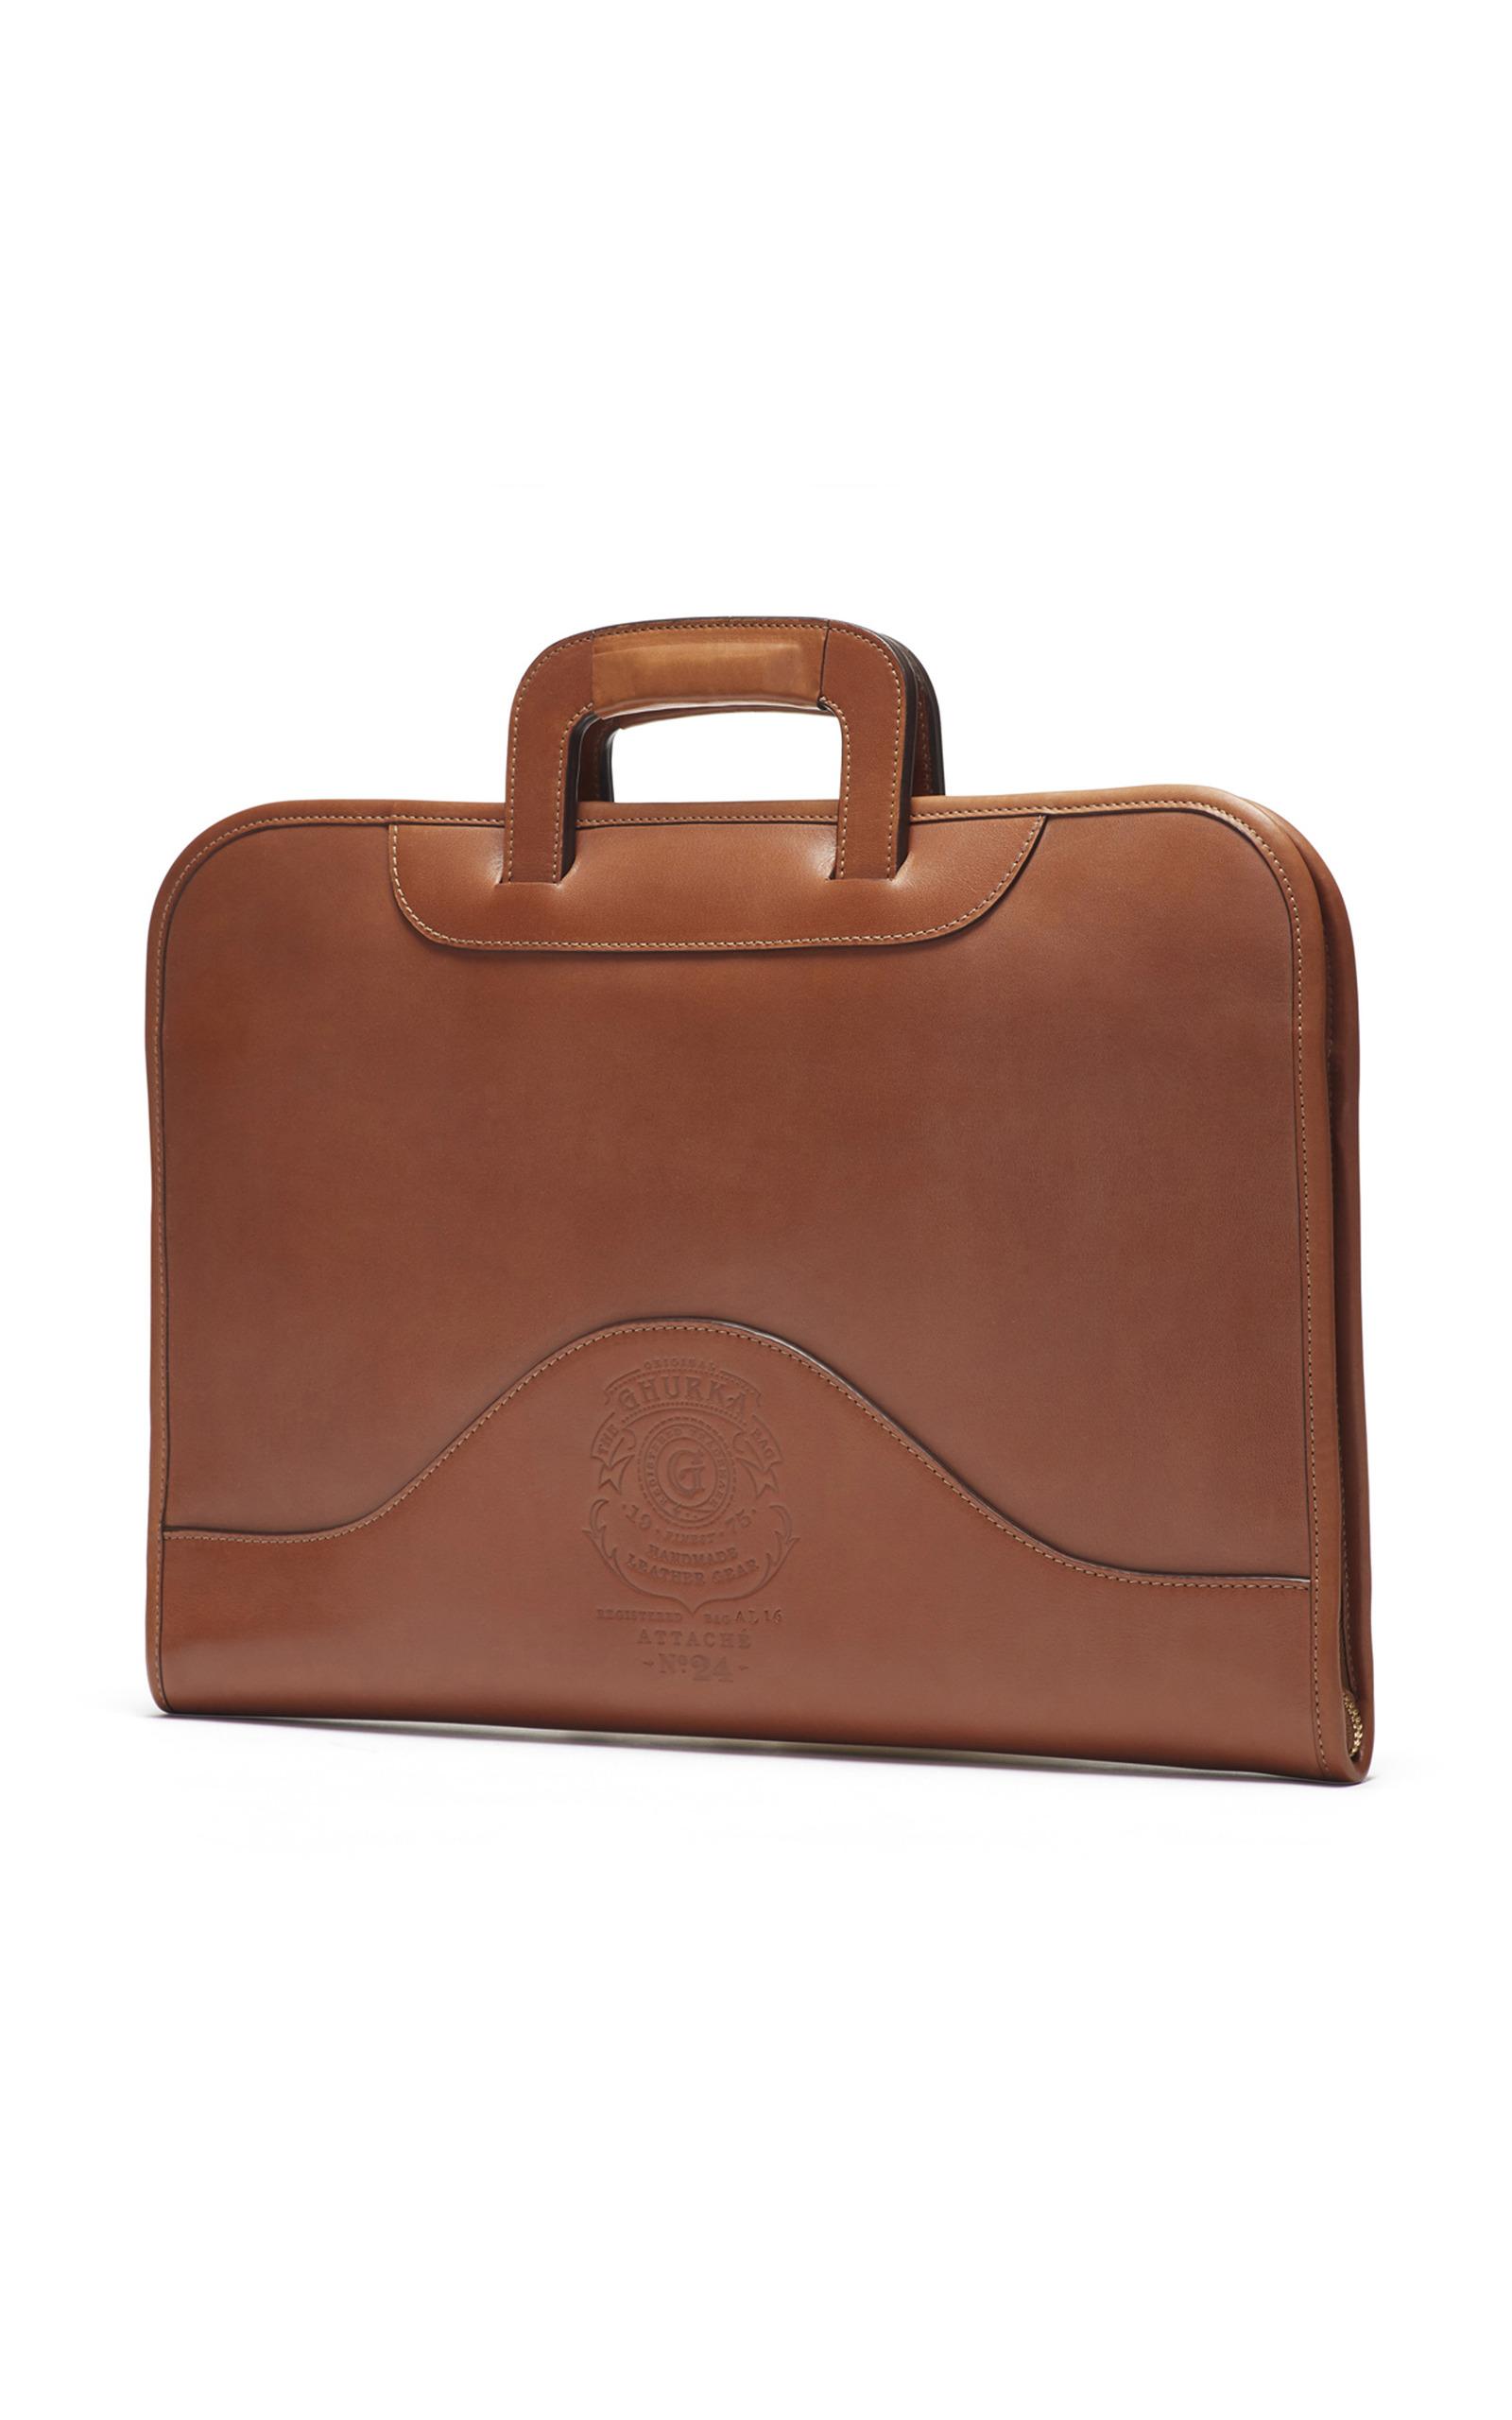 Wholesale Price Online Chestnut Leather Attache Ghurka Sale Cheap Price ZtzWJ9YNdd